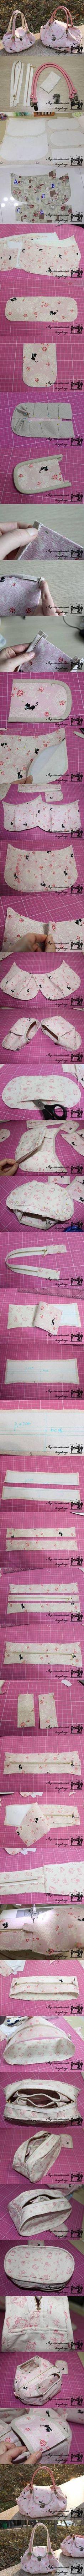 DIY Sew Cute Handbag diy craft #crafts craft ideas diy ideas diy crafts how to tutorial diy accessories fashion crafts craft handbag #diycrafts #handbagdiy #diyhandbag #sewingcrafts #fashionhandbags